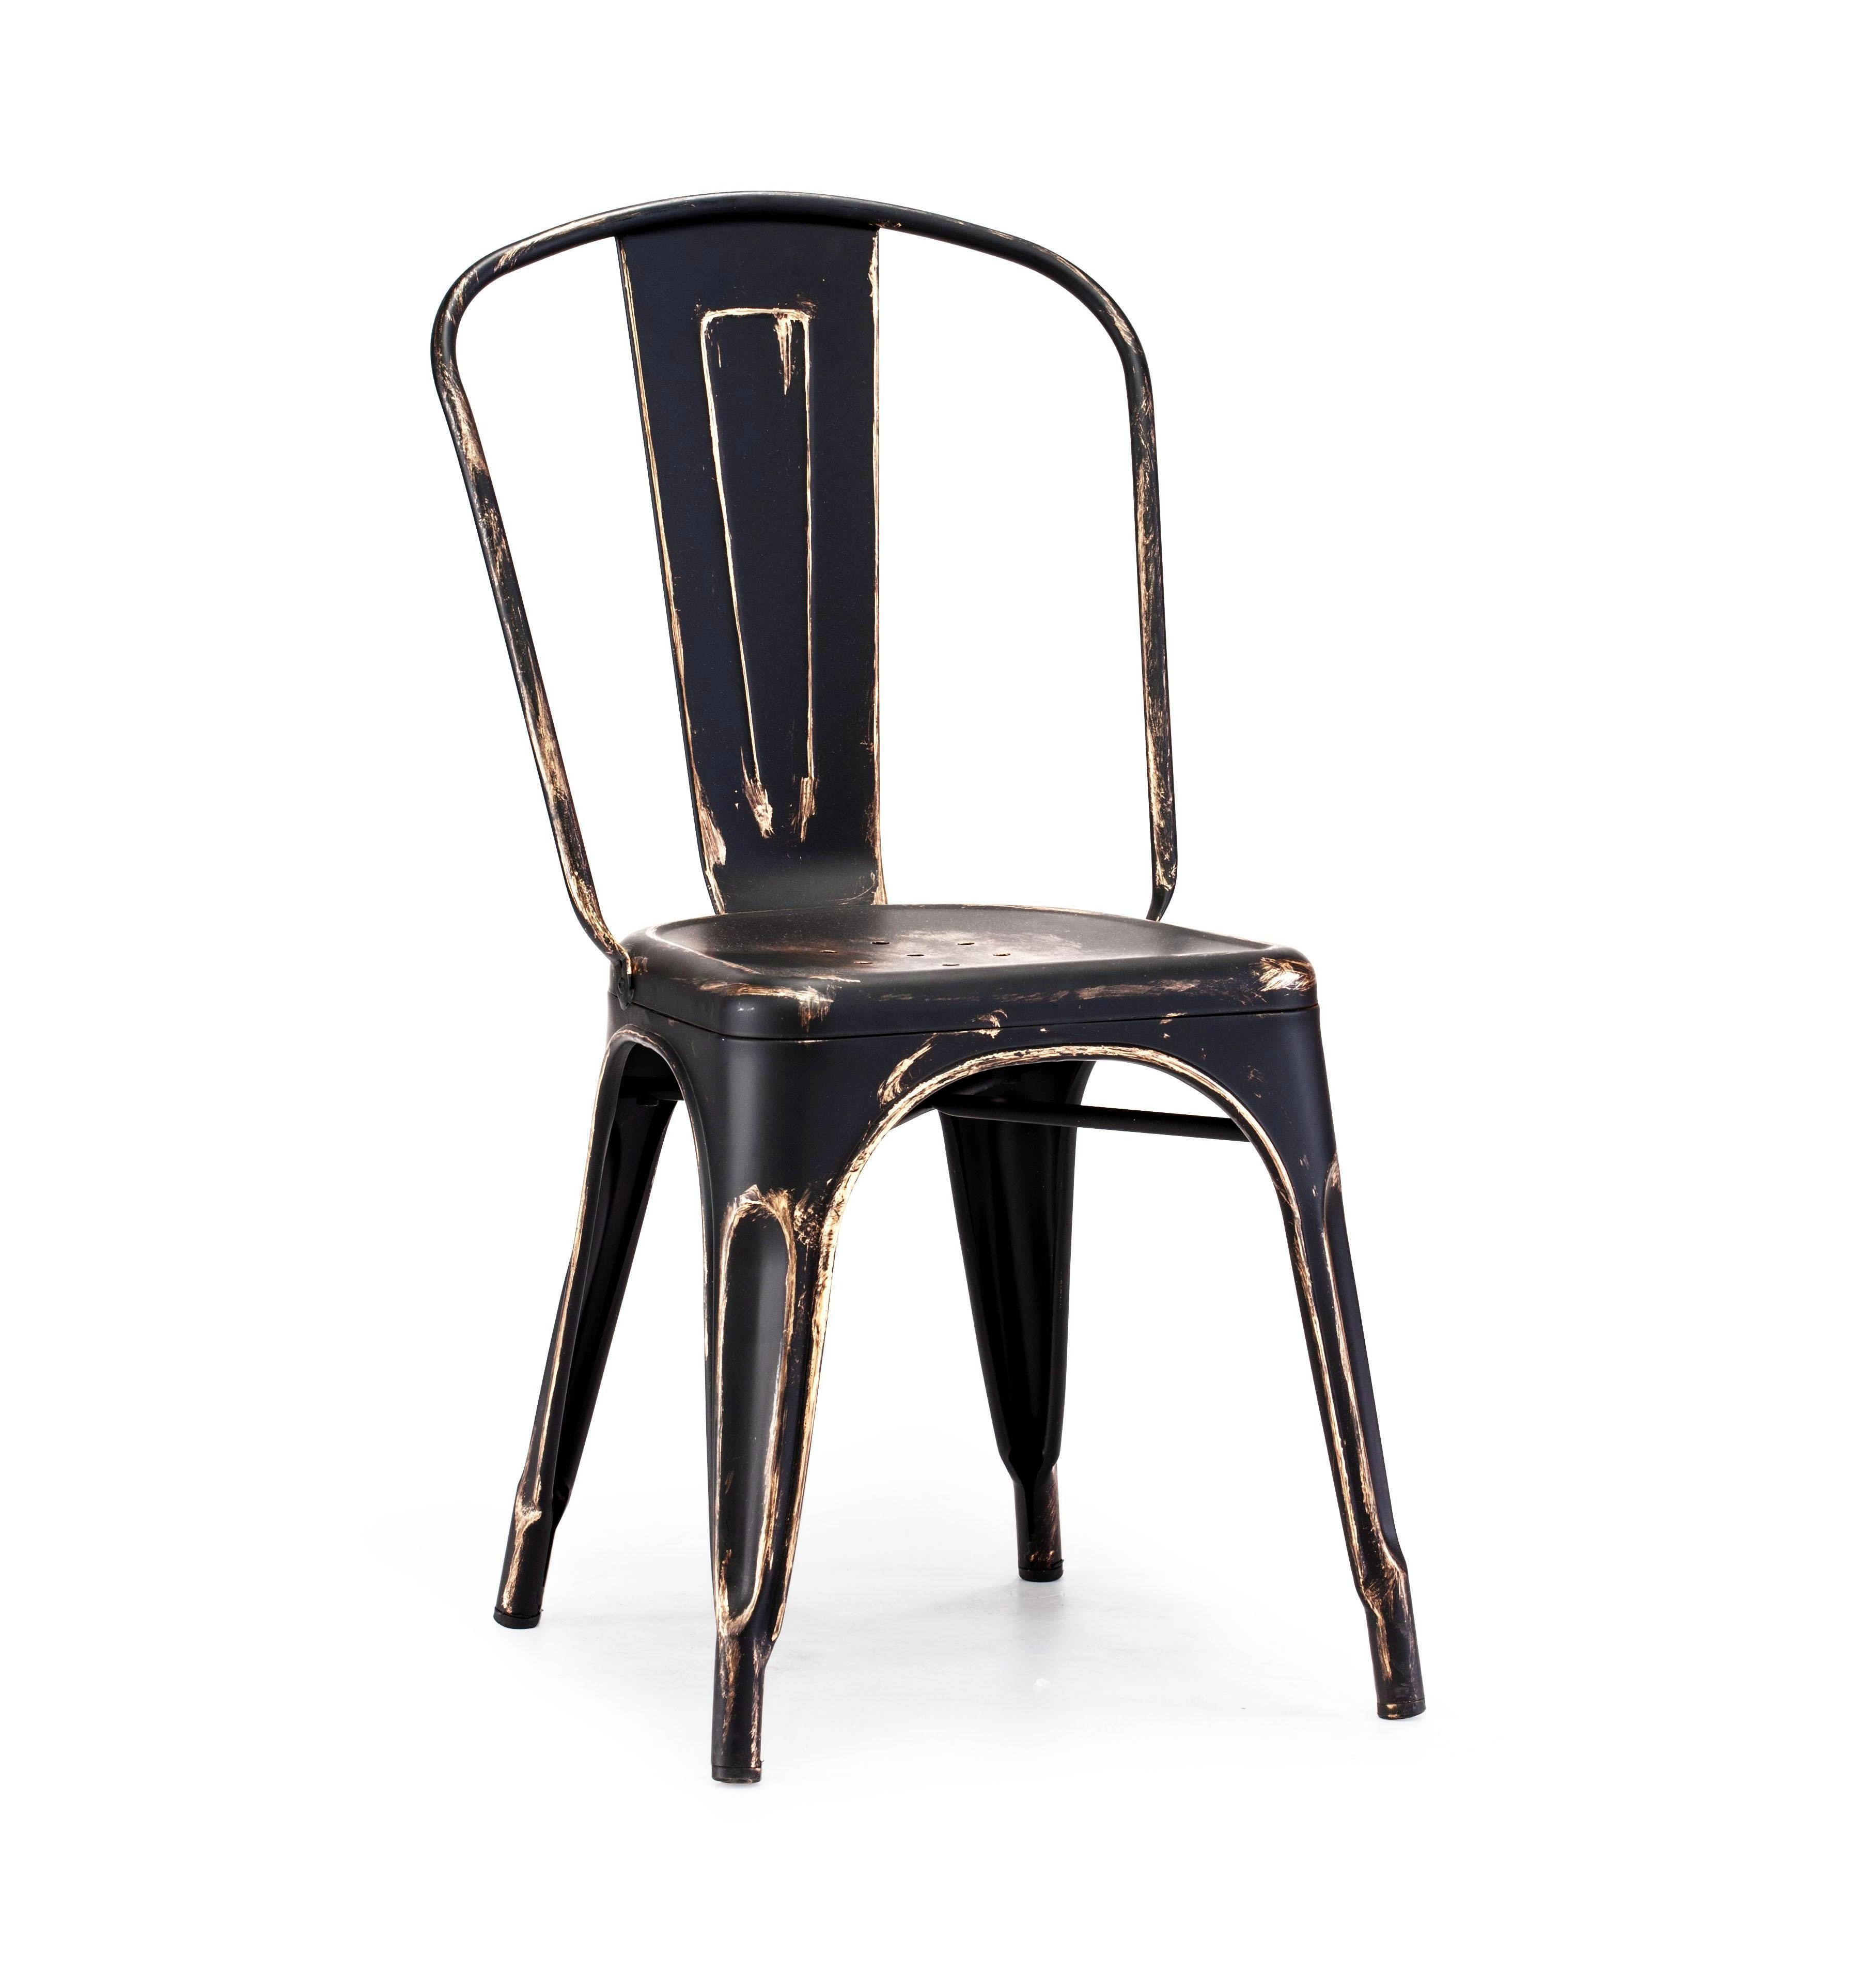 Black Gold Vintage Metal Tolix Chair U2013 Hospitality Chairs U2013  Hospitalitychairs.com